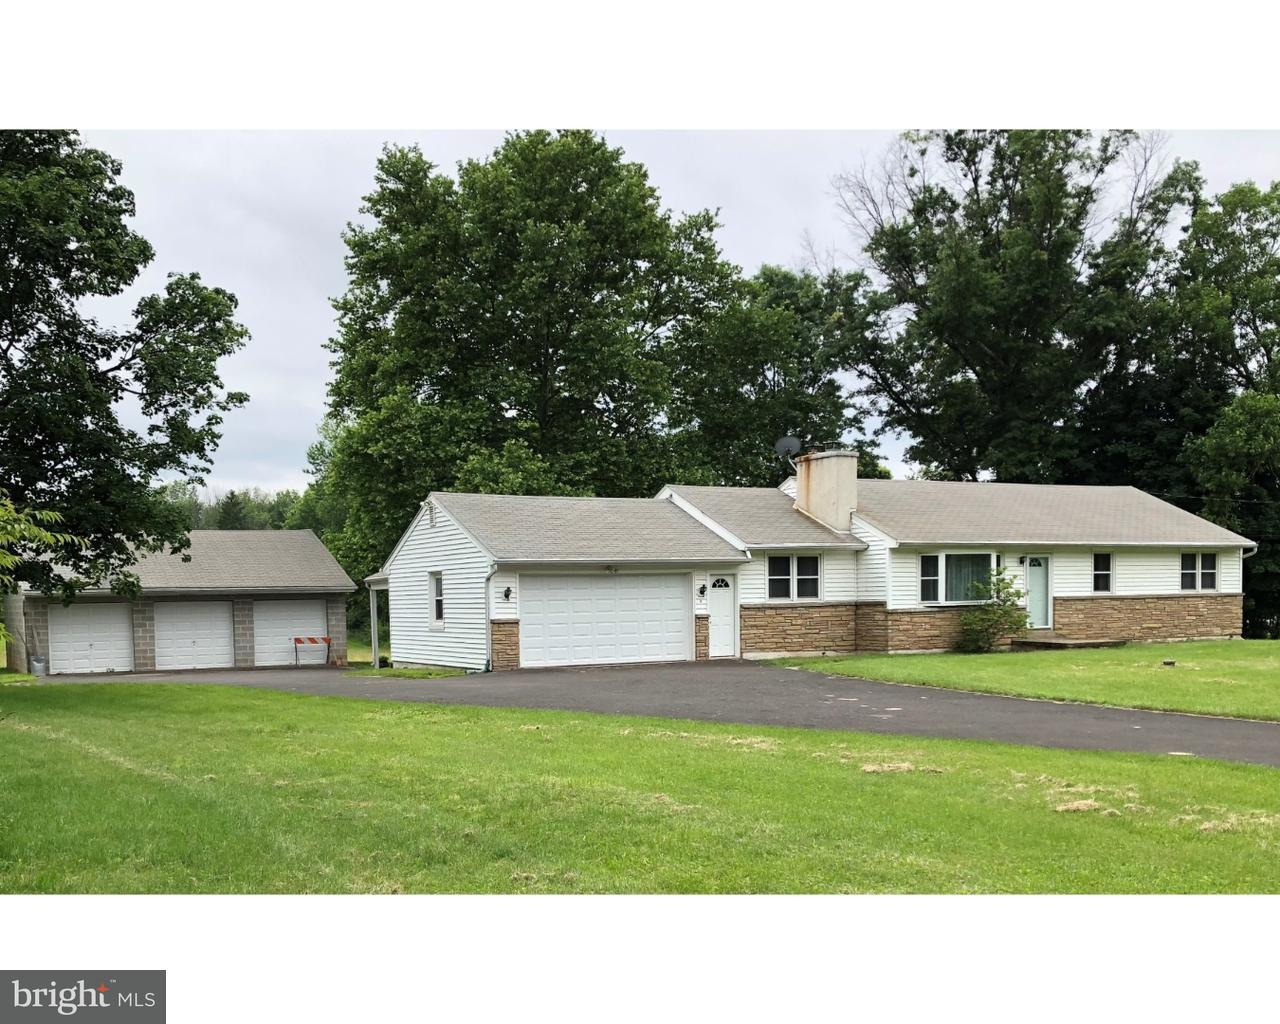 sc 1 st  Bucks County & 285 EDISON FURLONG ROAD DOYLESTOWN PA 18901 - Pennsylvania 1001939146